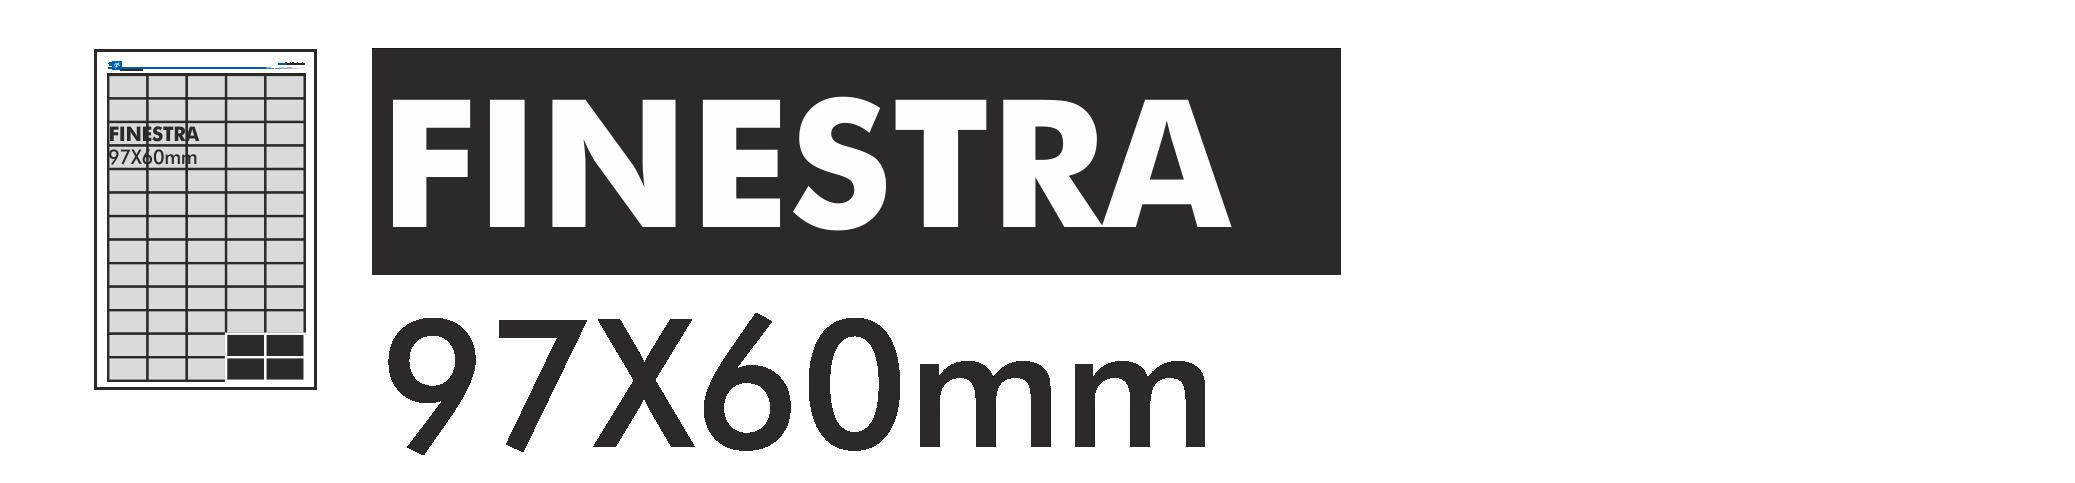 Finestra 97x60mm